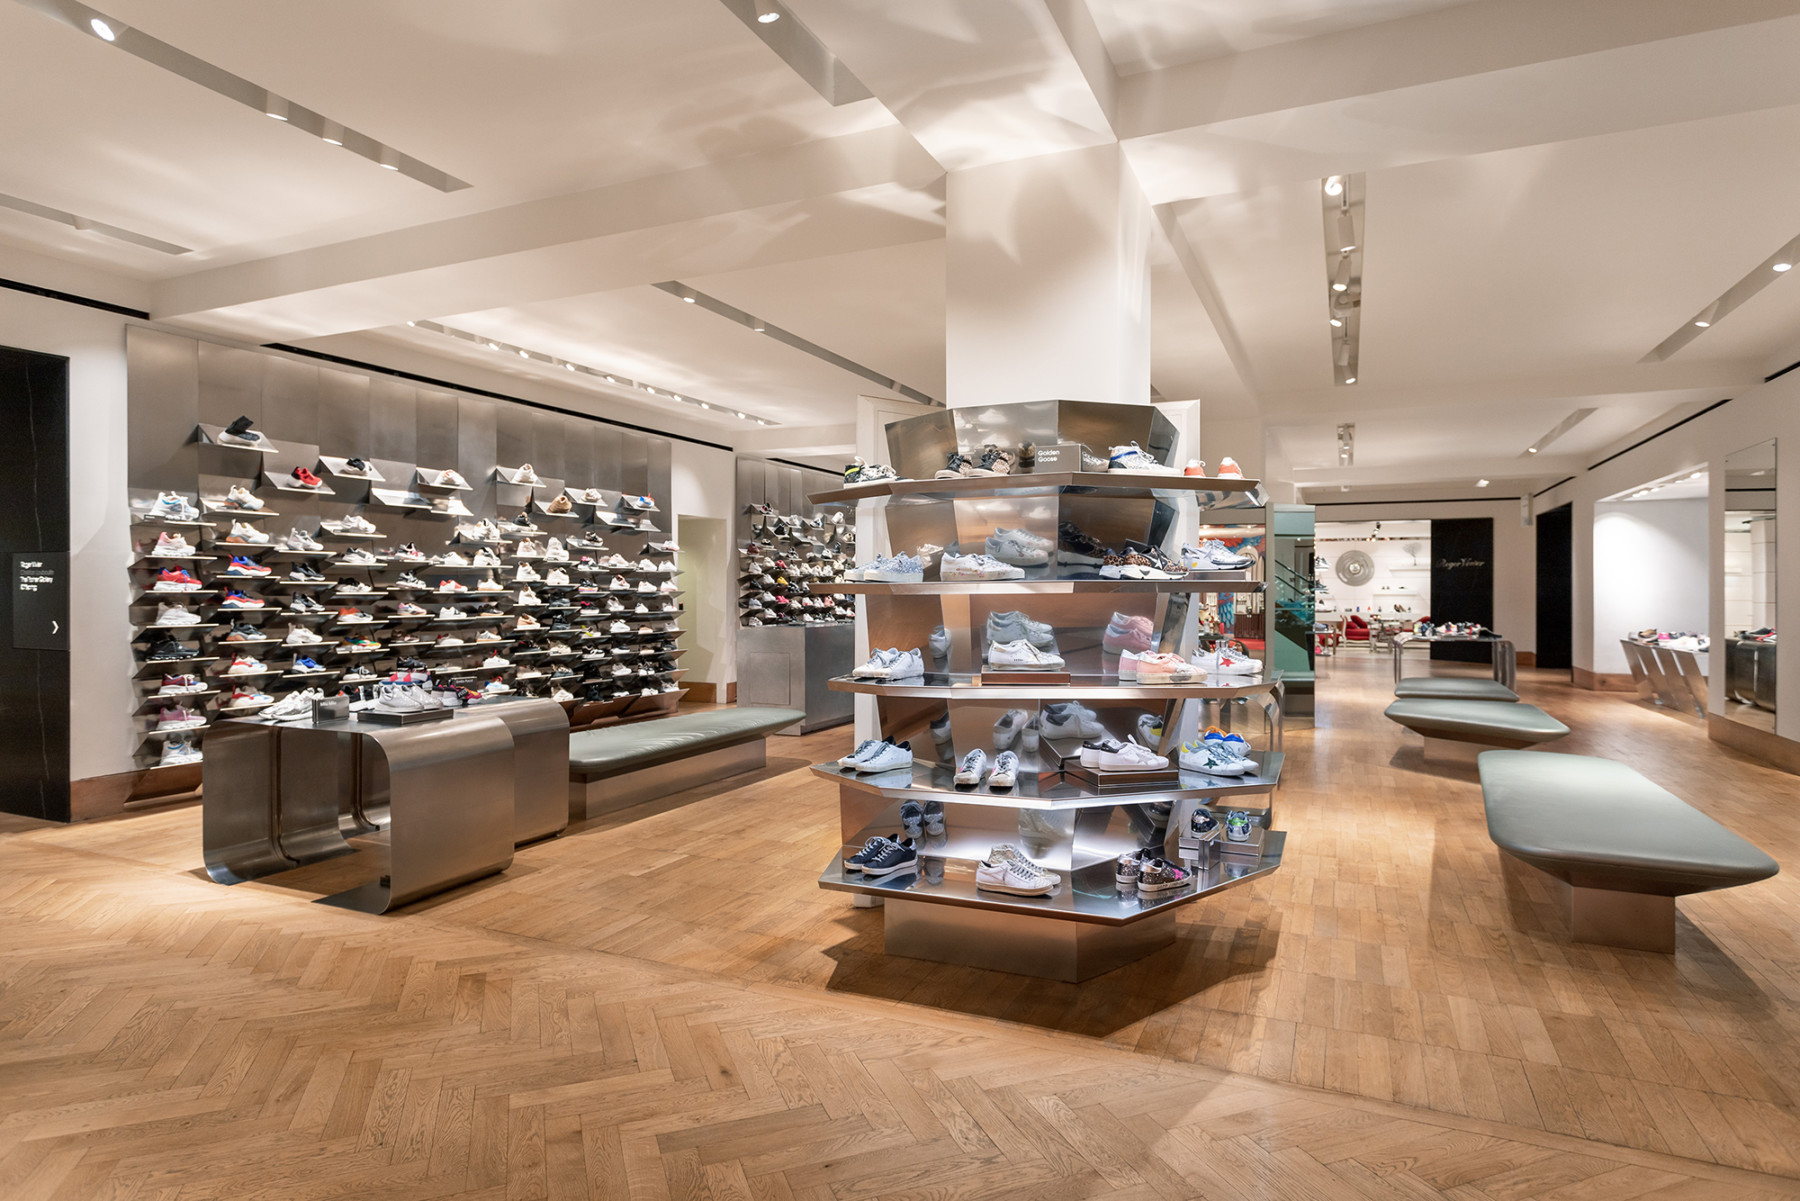 jamie-fobert-architects-selfridges-shoe-galleries-luxury-retail-concept-gallery-design-olivier-hess-photos-sneaker-wall